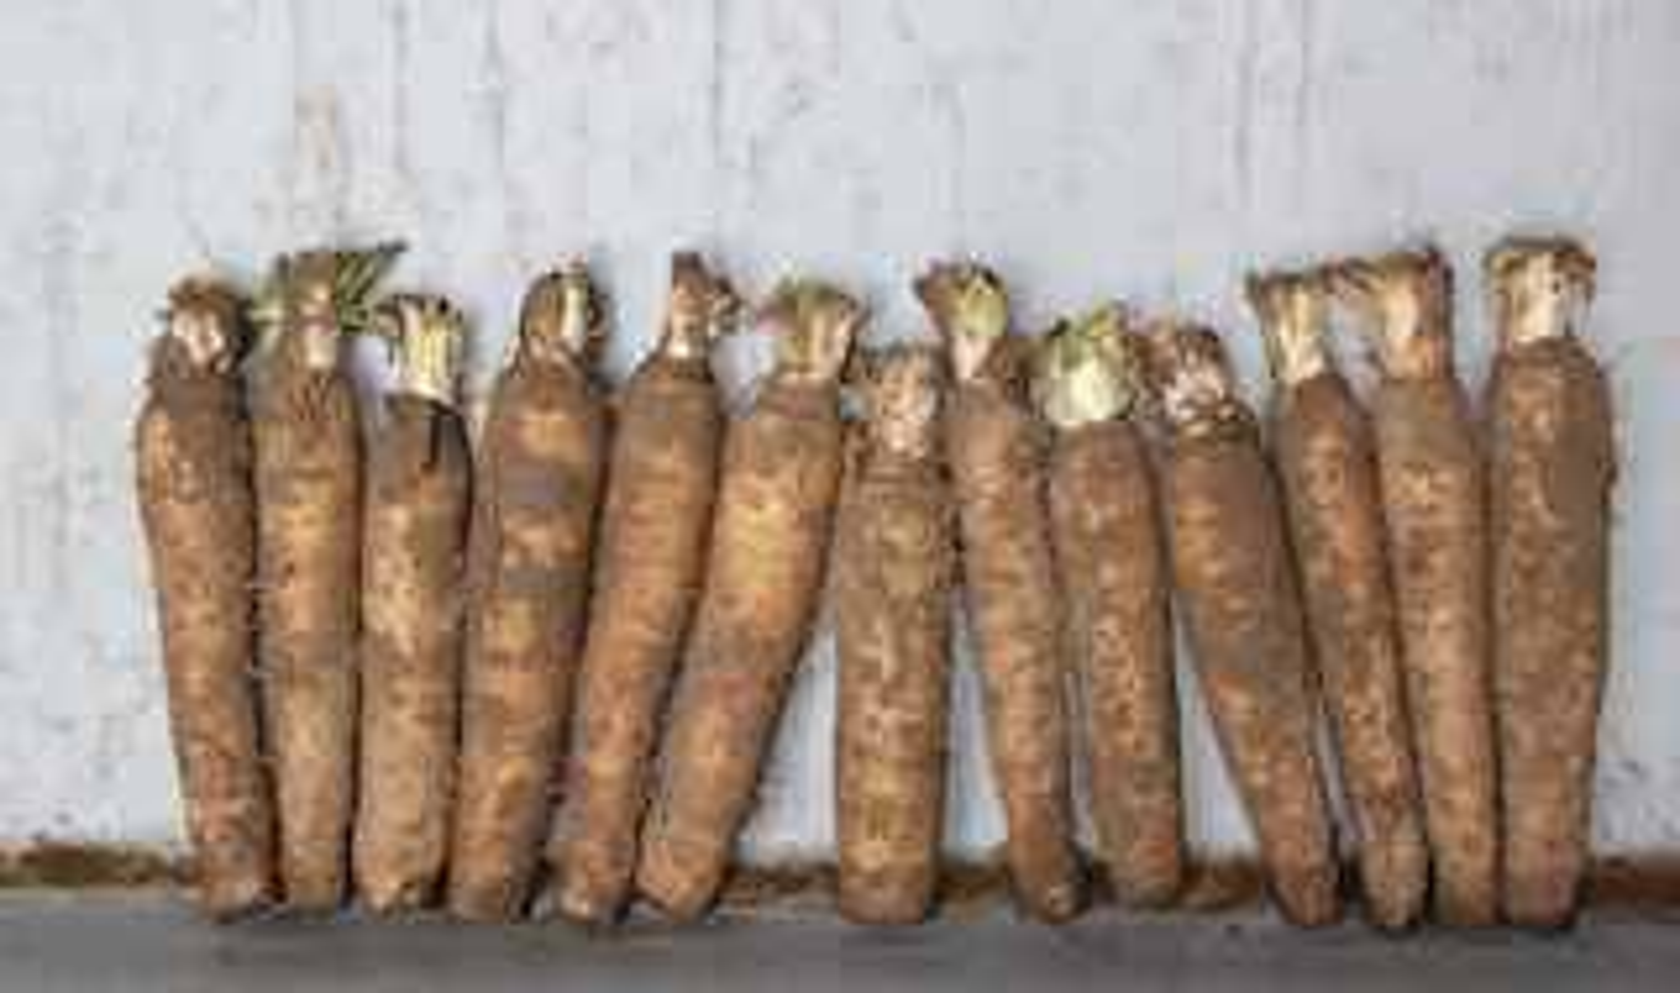 Grond-witloofwortels-50-stuks-10kg-